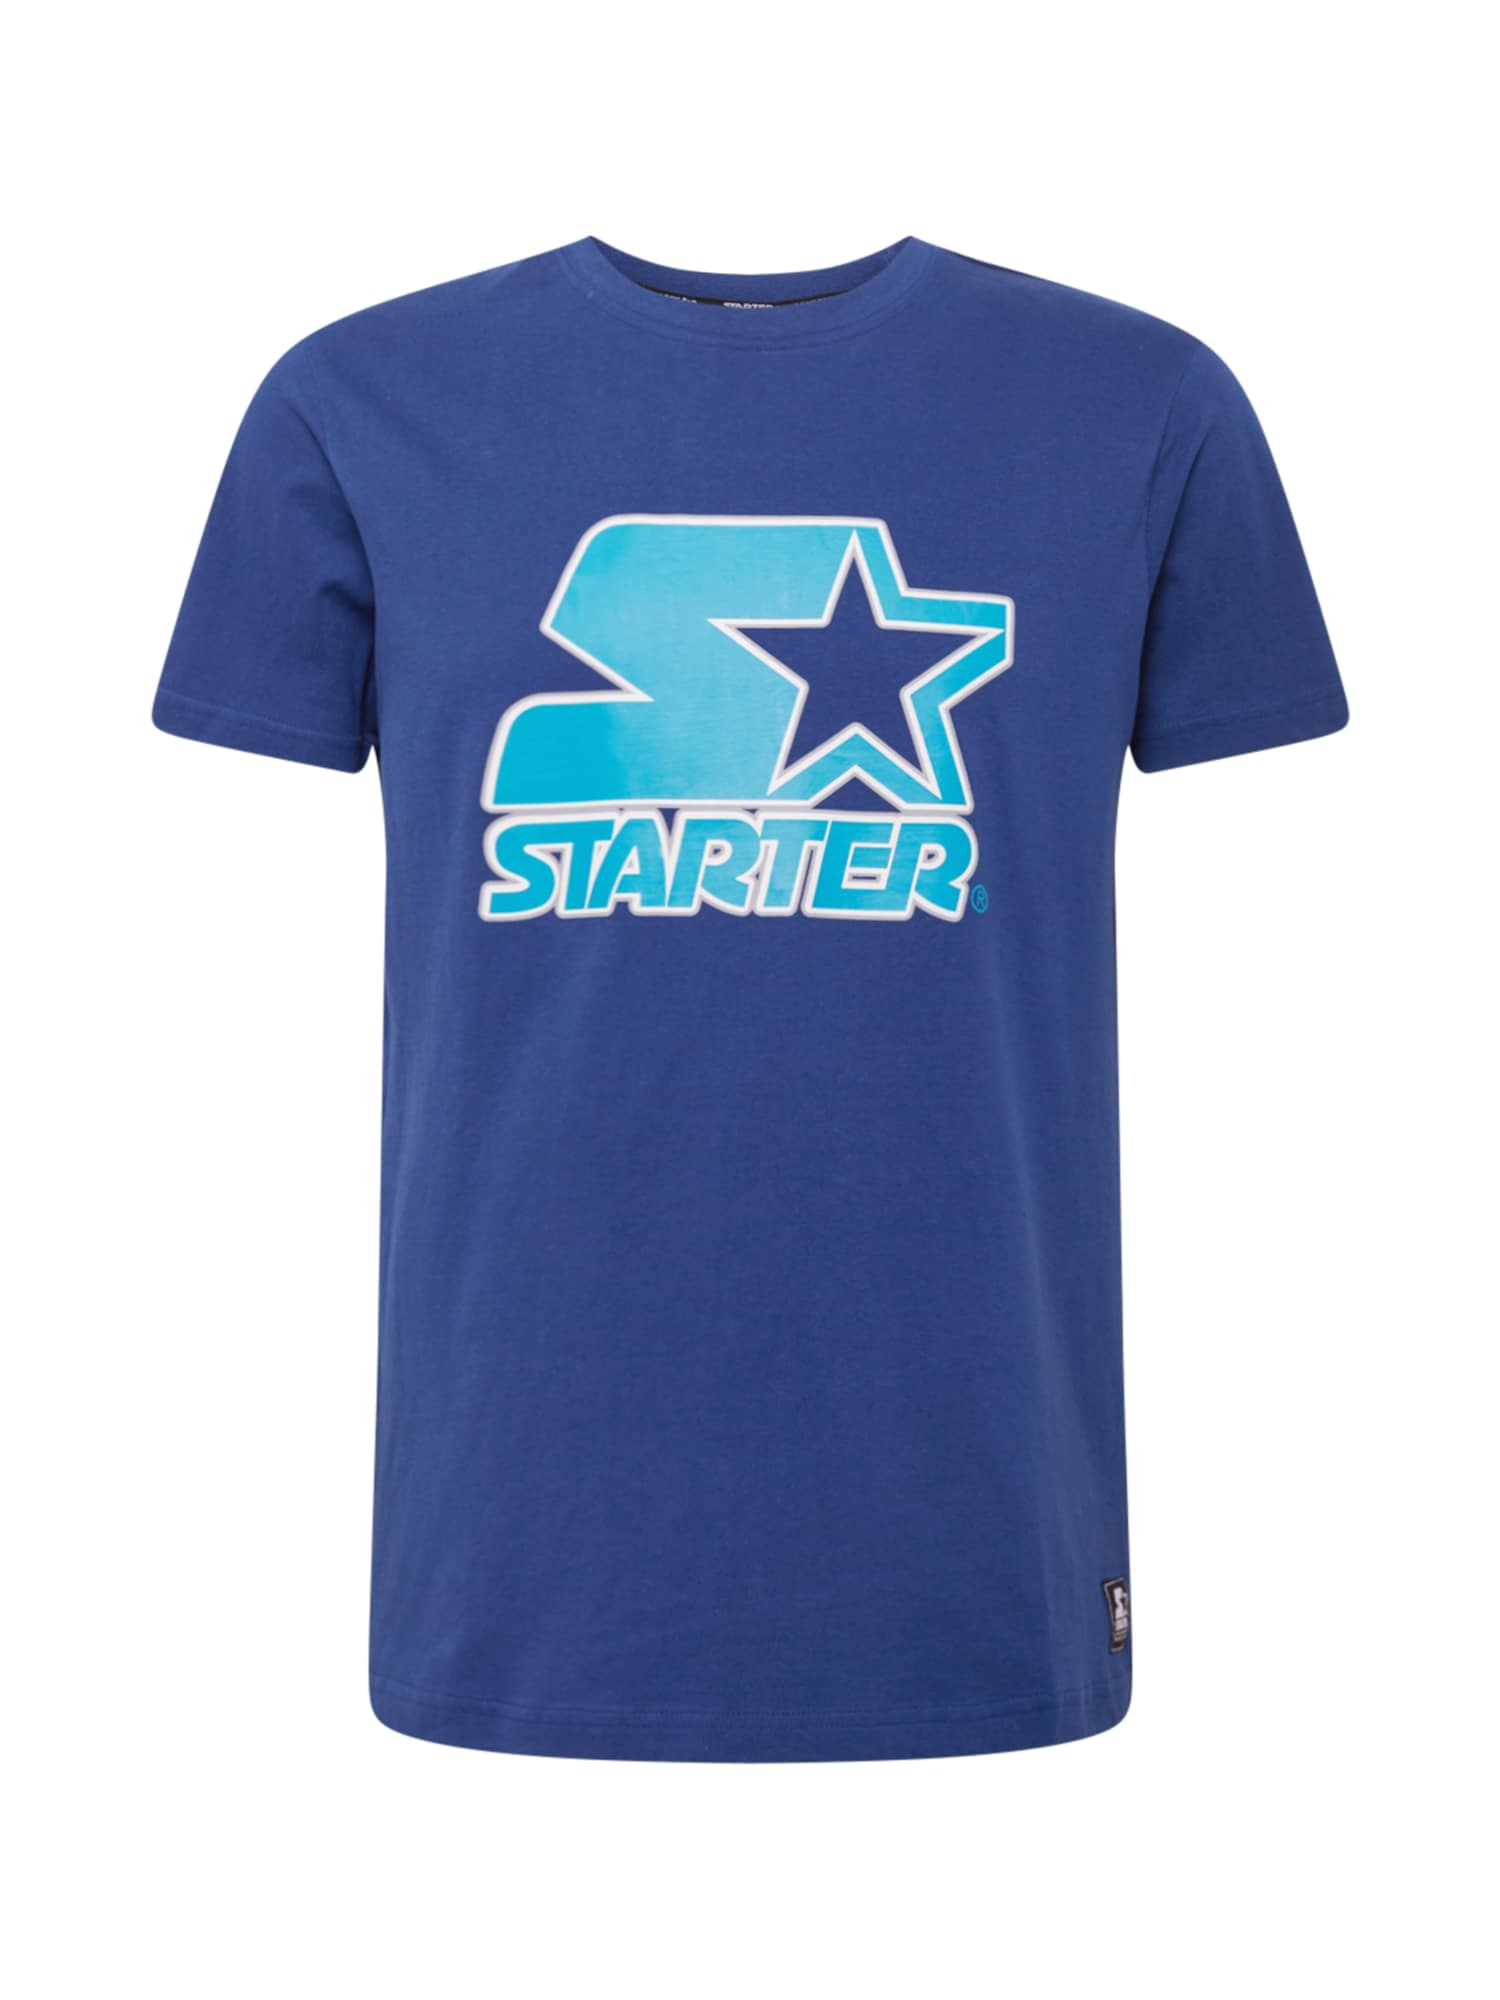 Starter Black Label Marškinėliai mėlyna